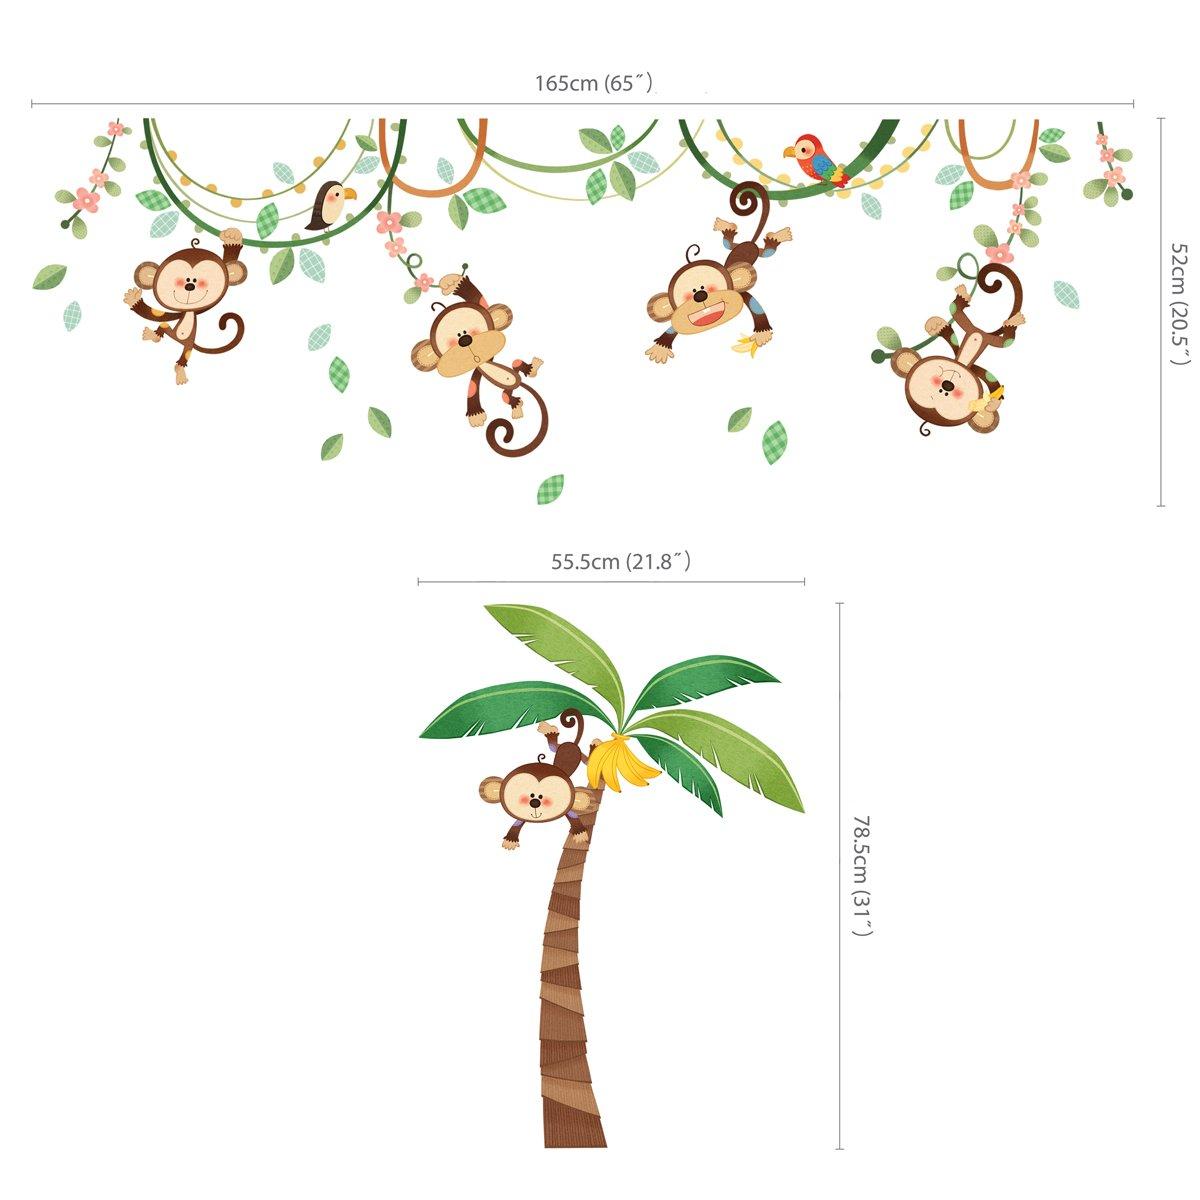 decowall da 1507 monkeys on vine kids wall stickers wall decals